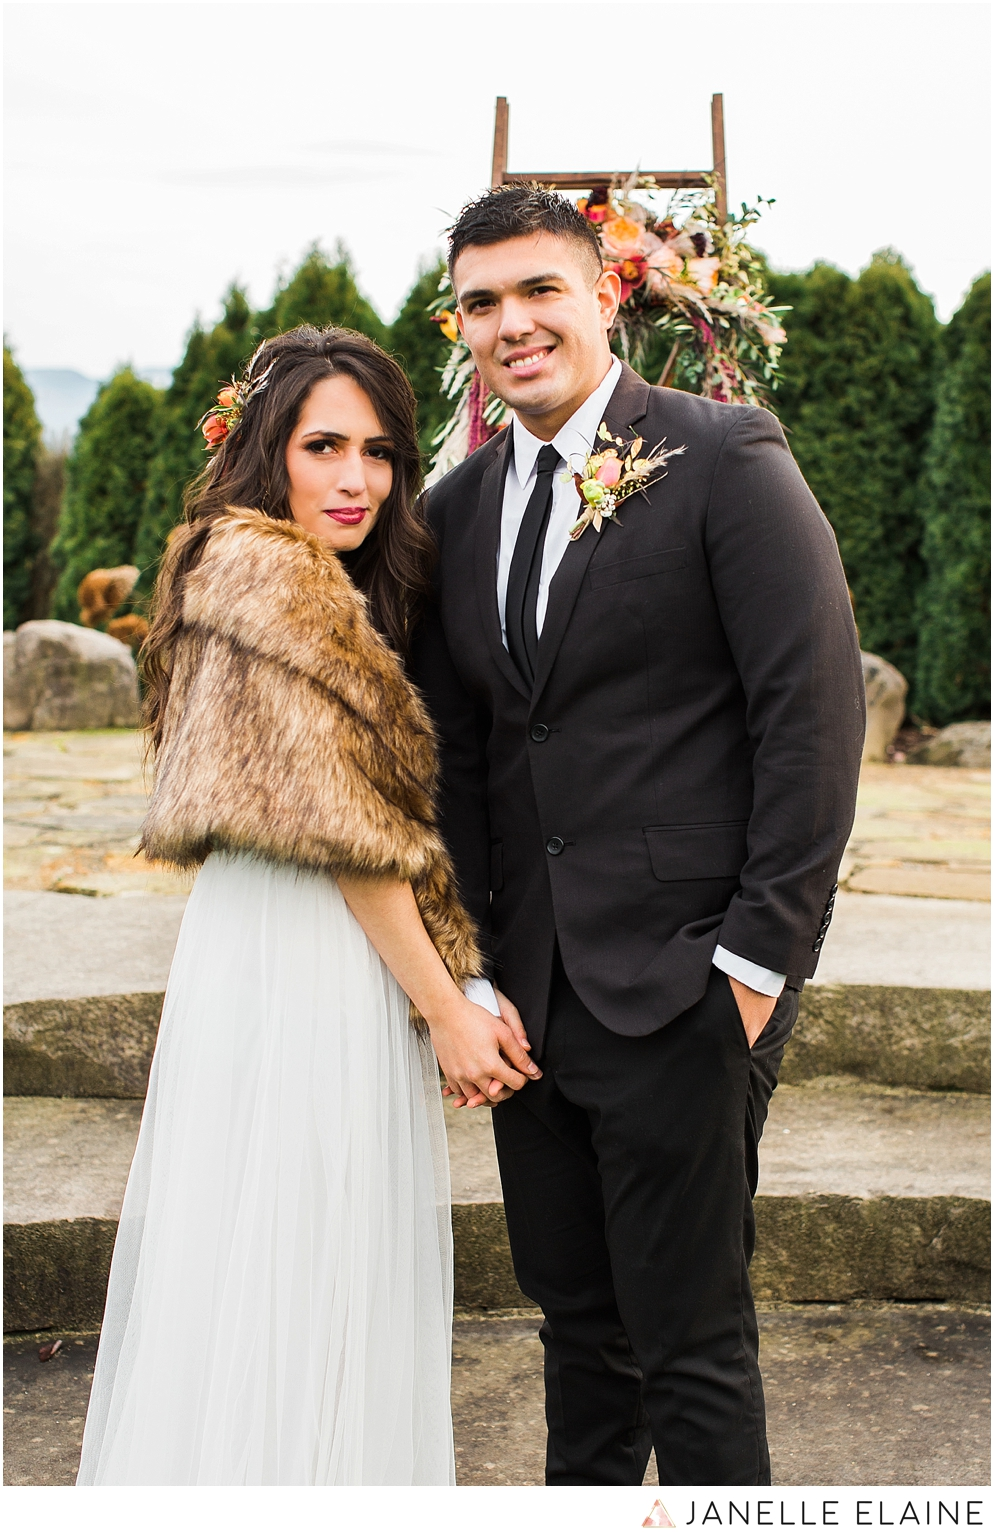 elopement-wedding-photographer-seattle washington-photographers-89.jpg